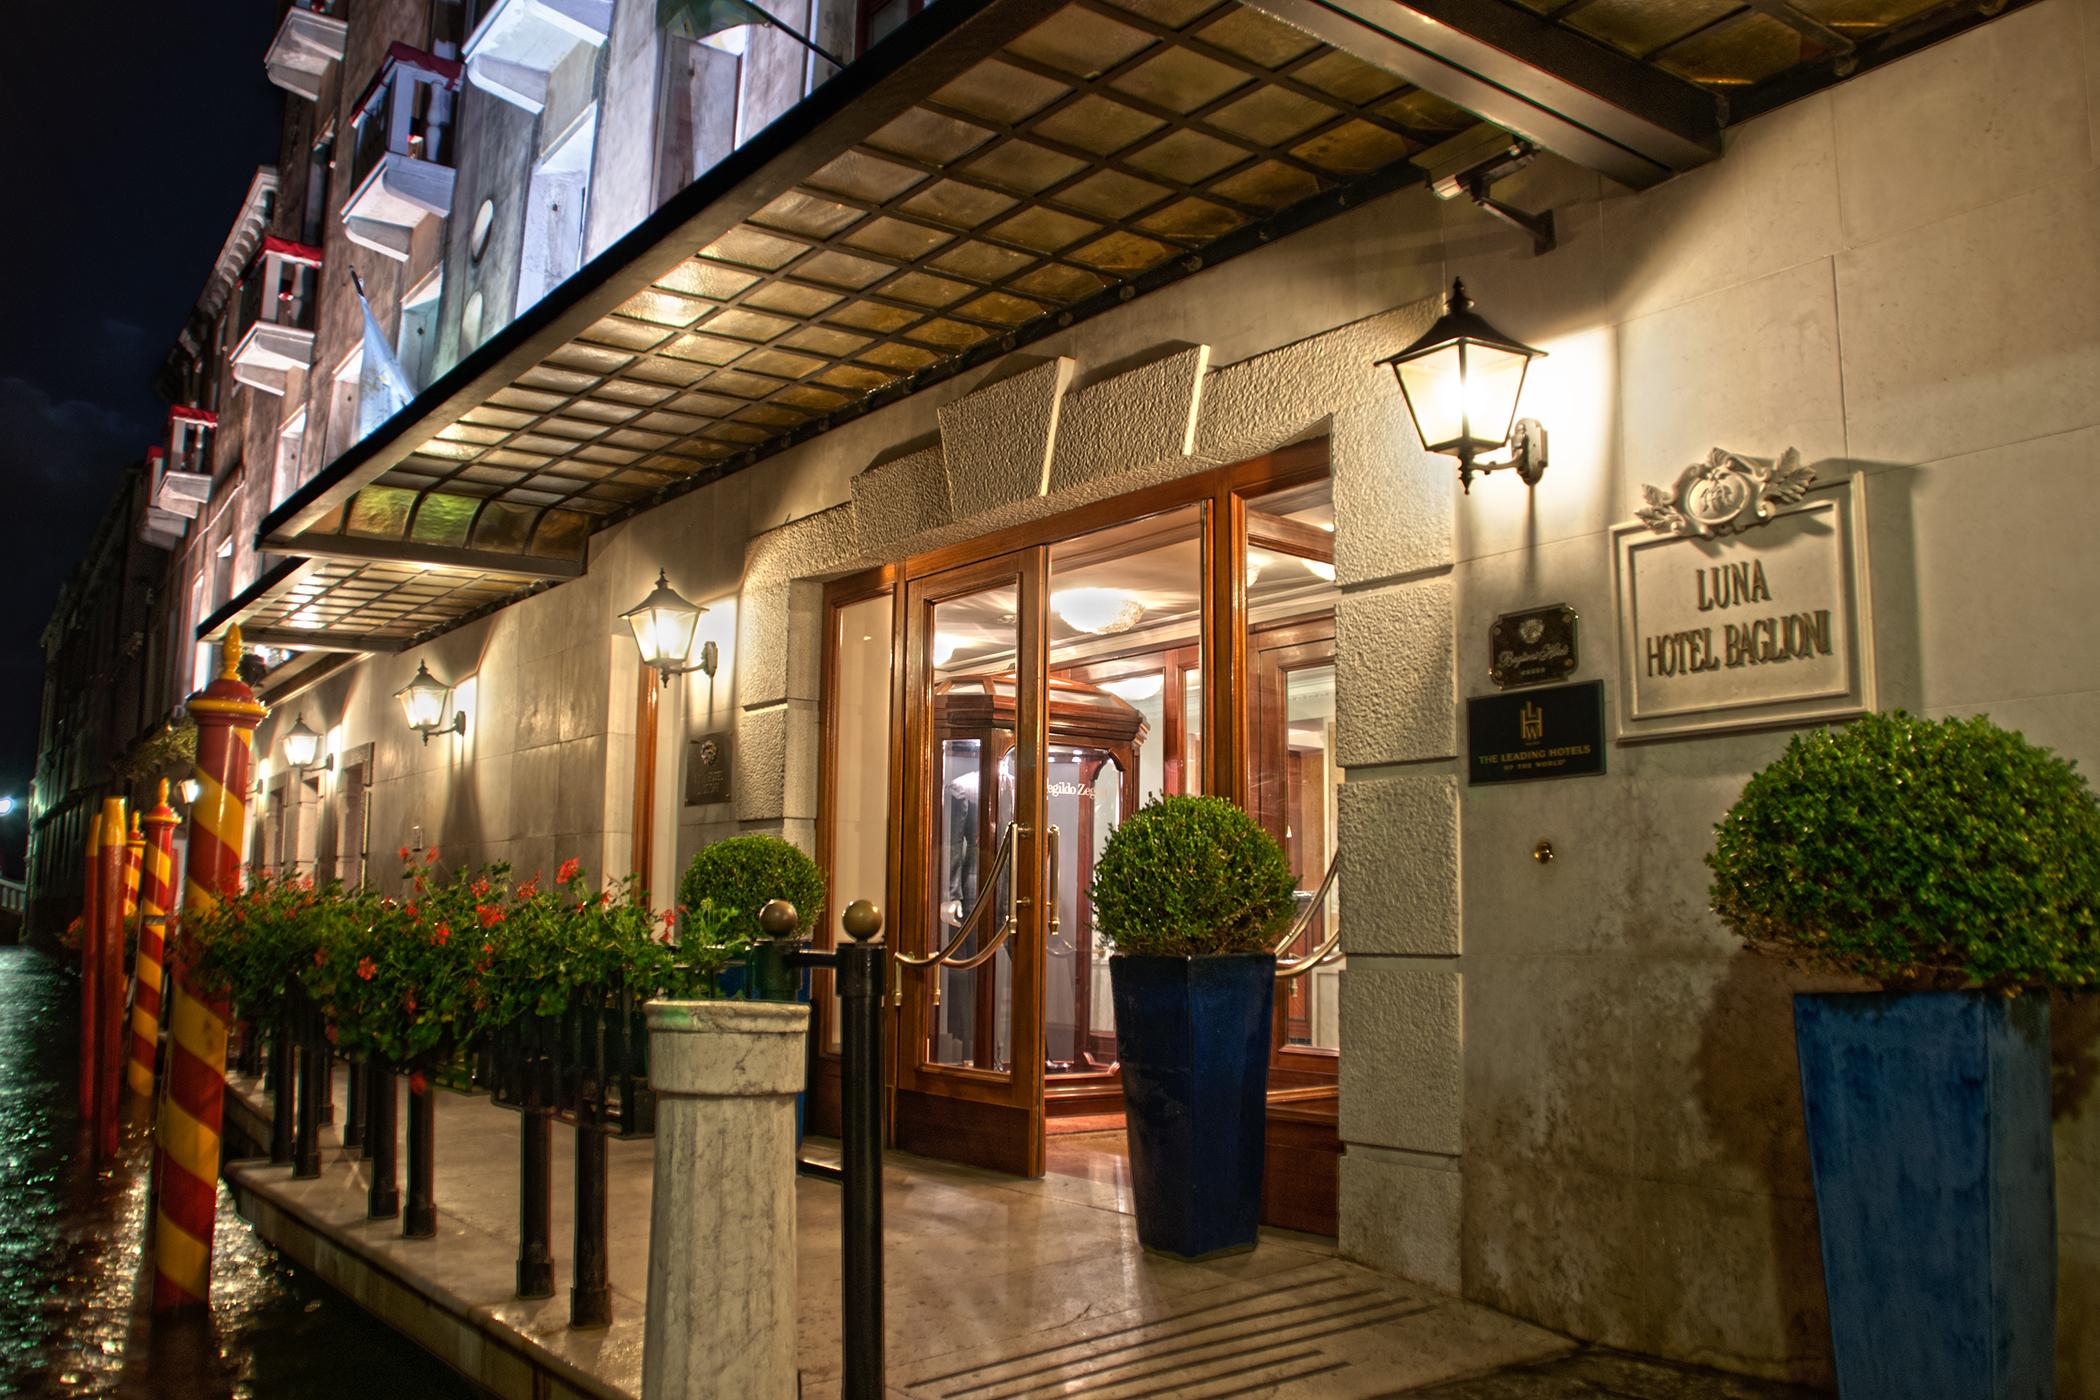 Baglioni Hotel Luna Interior Designer